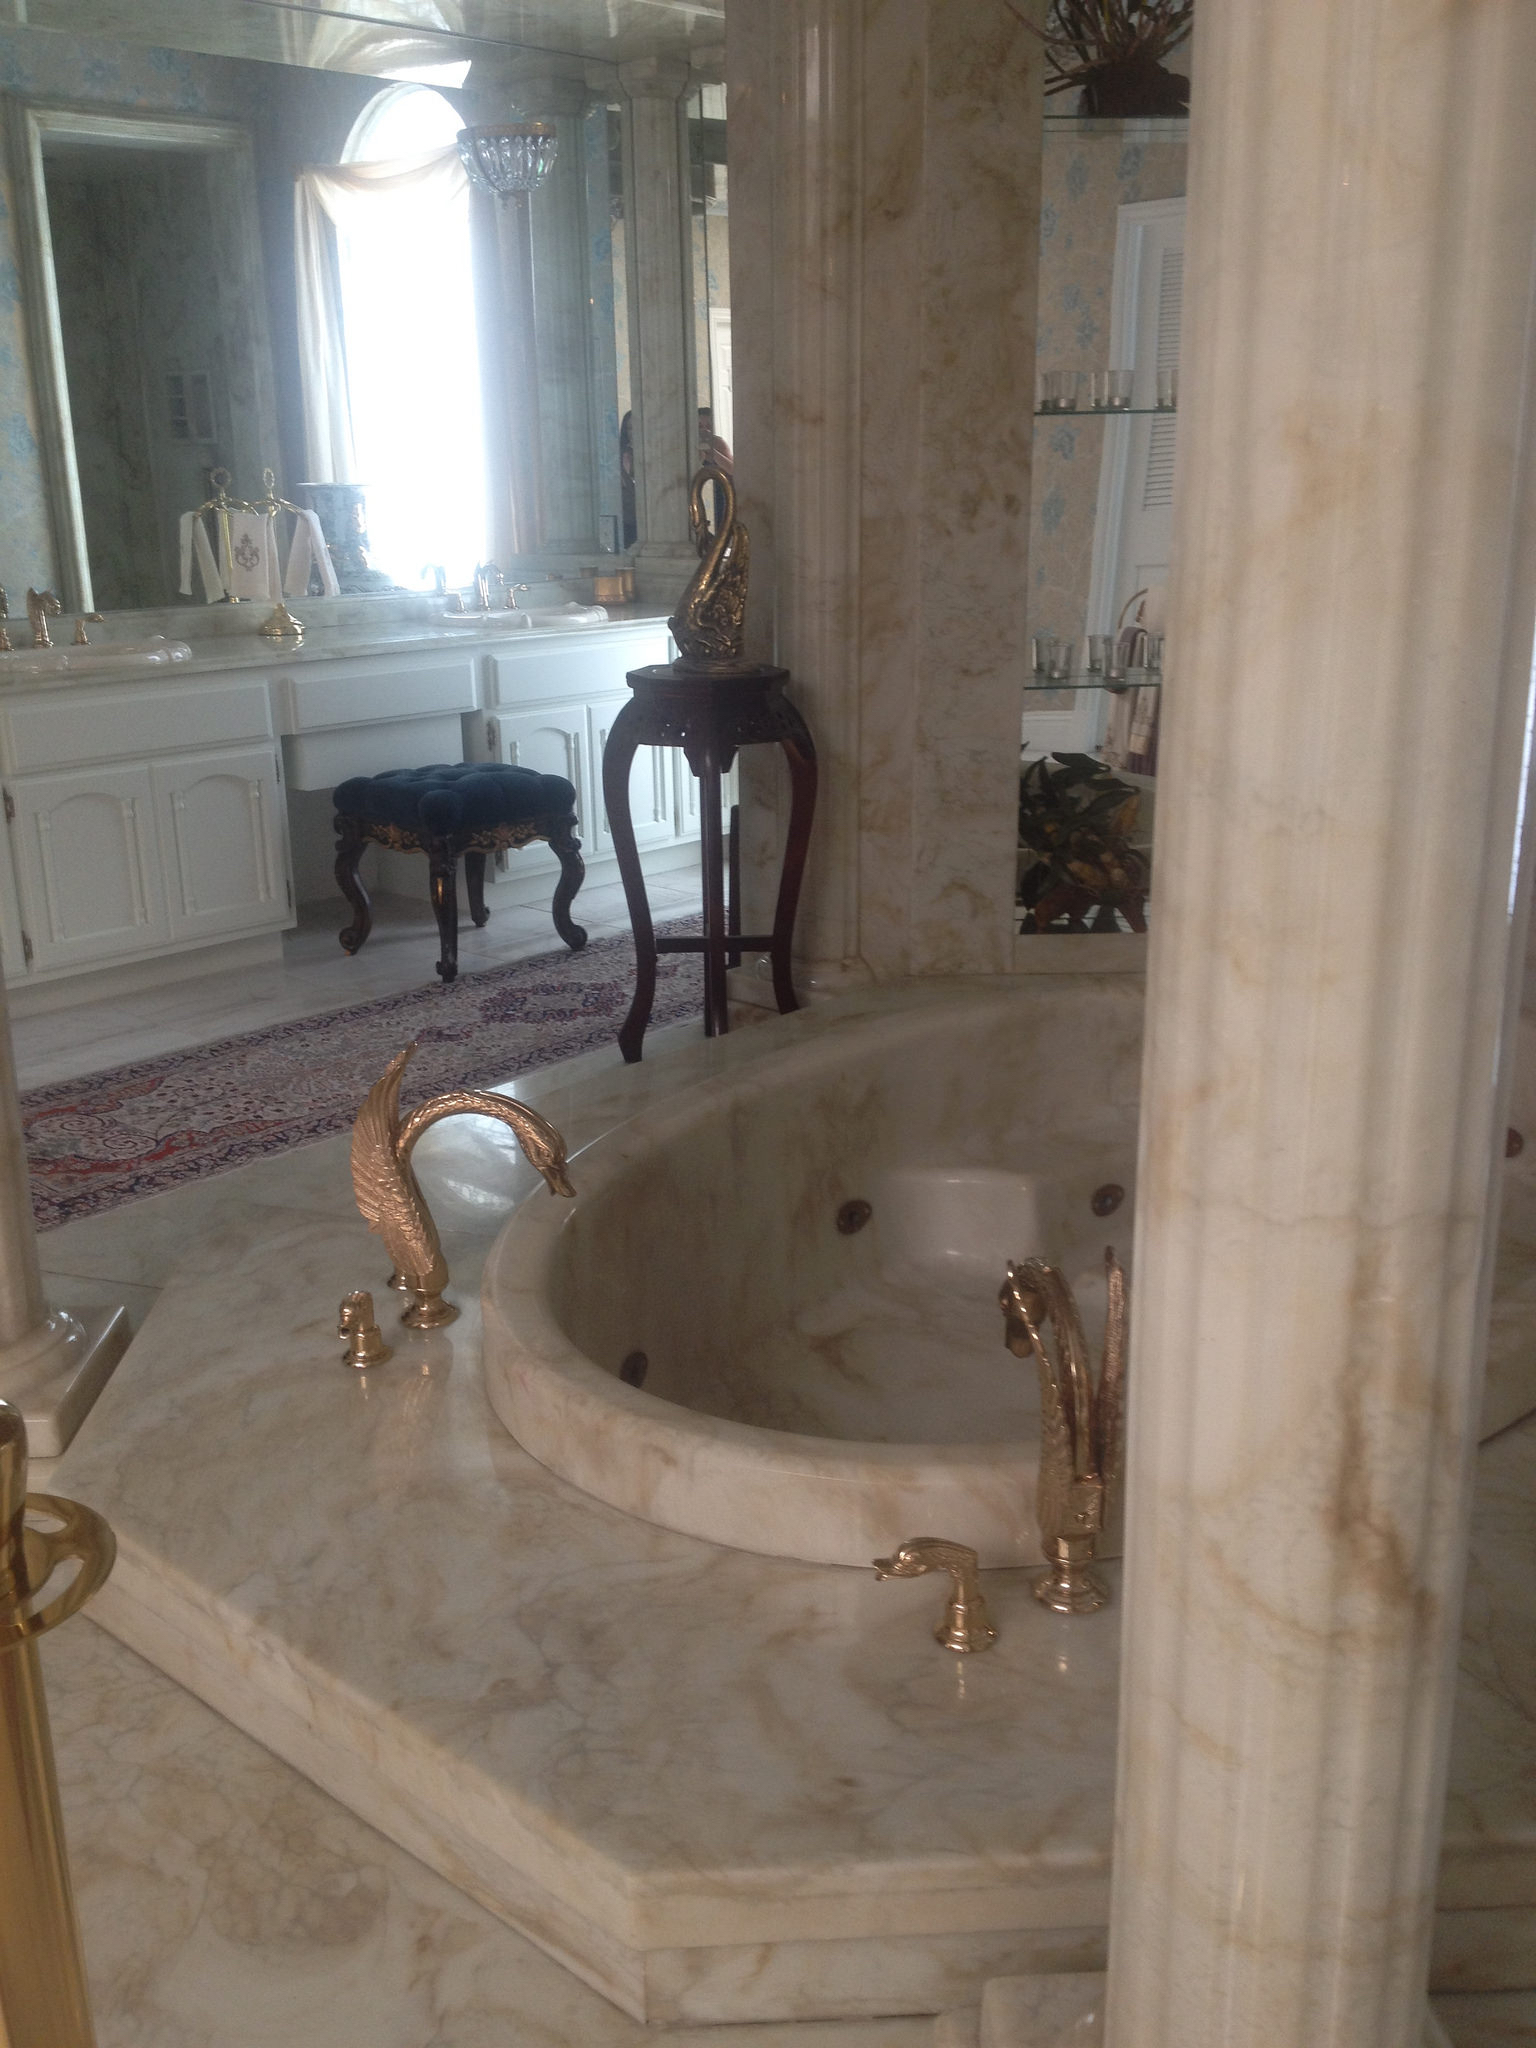 Just your everyday bathtub